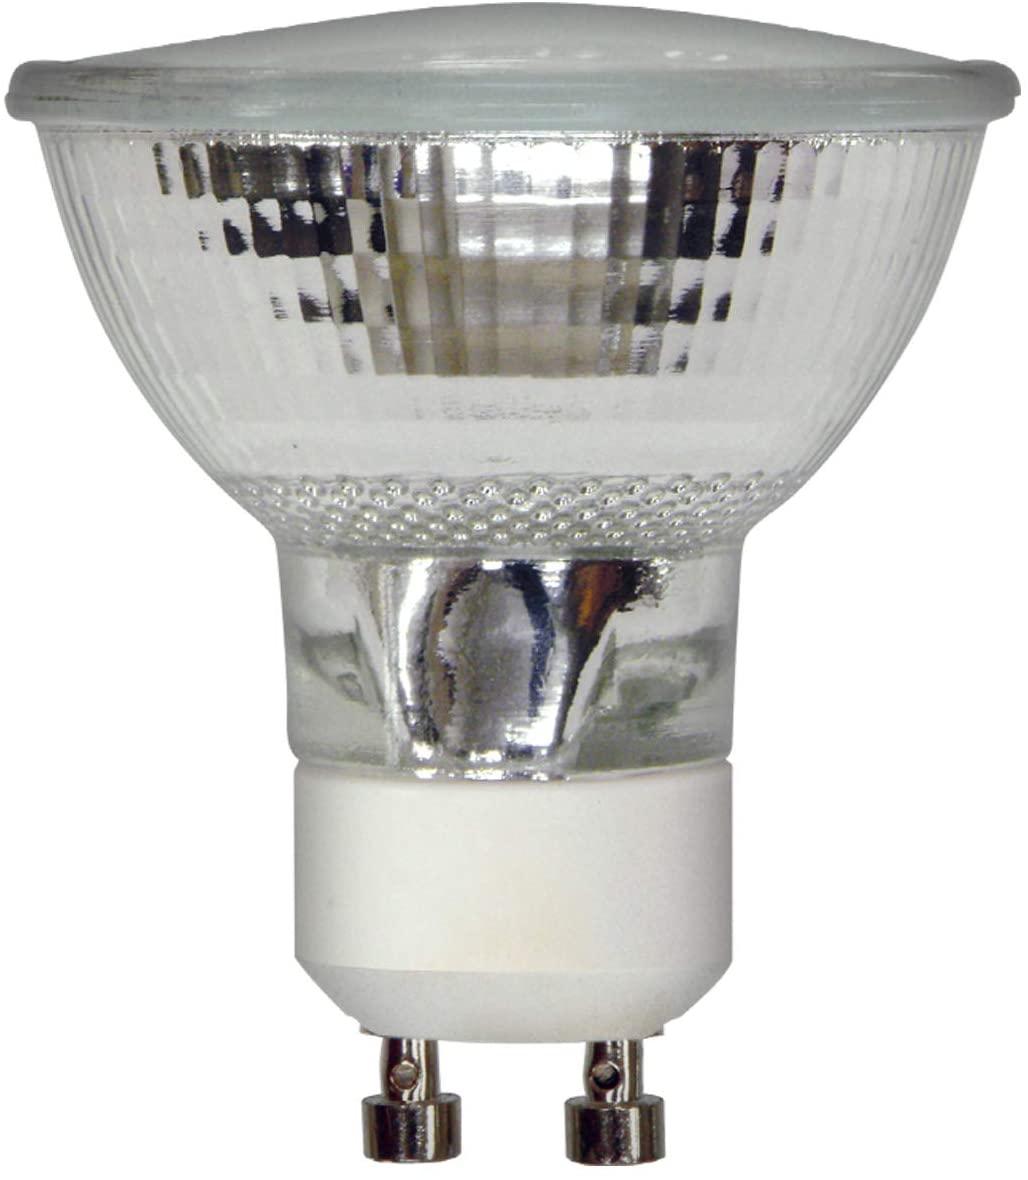 GE Reveal HD Halogen Indoor Flood Light Bulb (50 Watt Halogen Light Bulbs), 400 Lumen, GU10 Base Light Bulb, 1-Pack Floodlight Bulbs